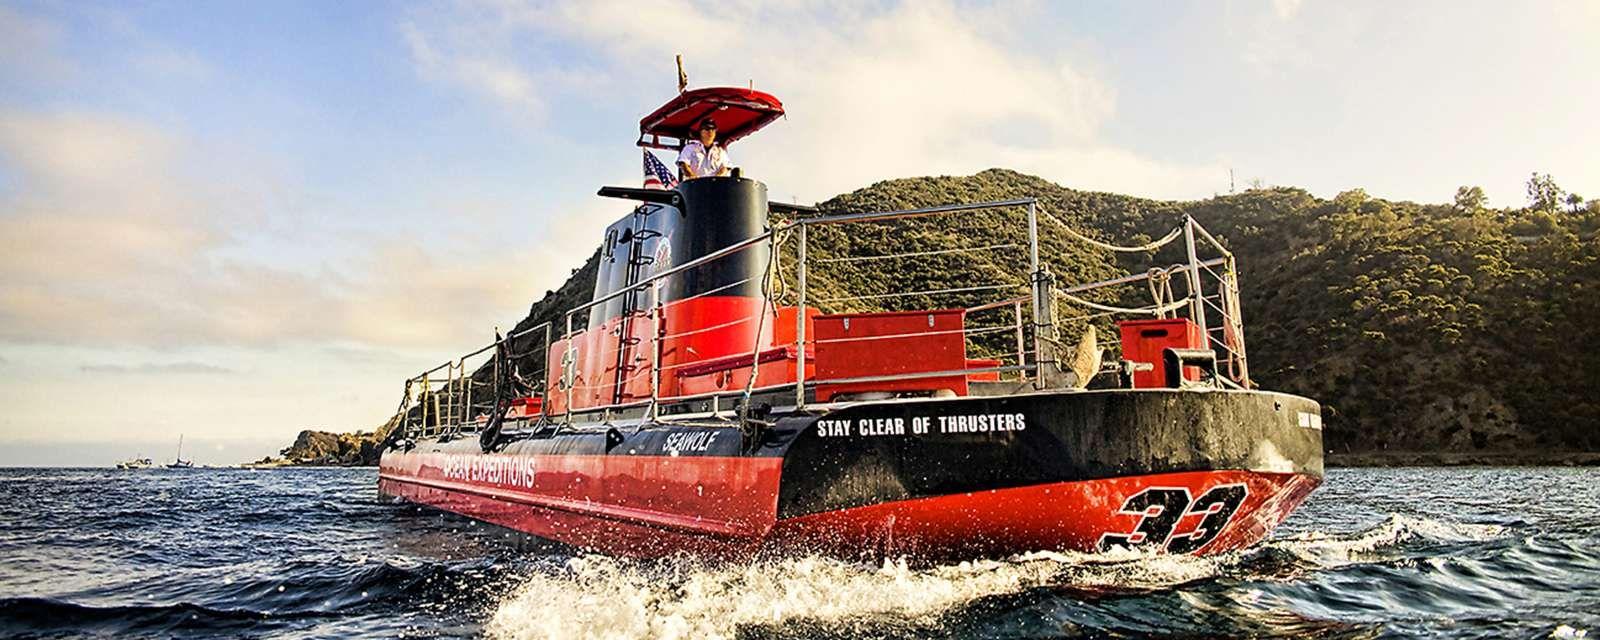 Undersea Expedition SemiSubmersible Vessel Visit